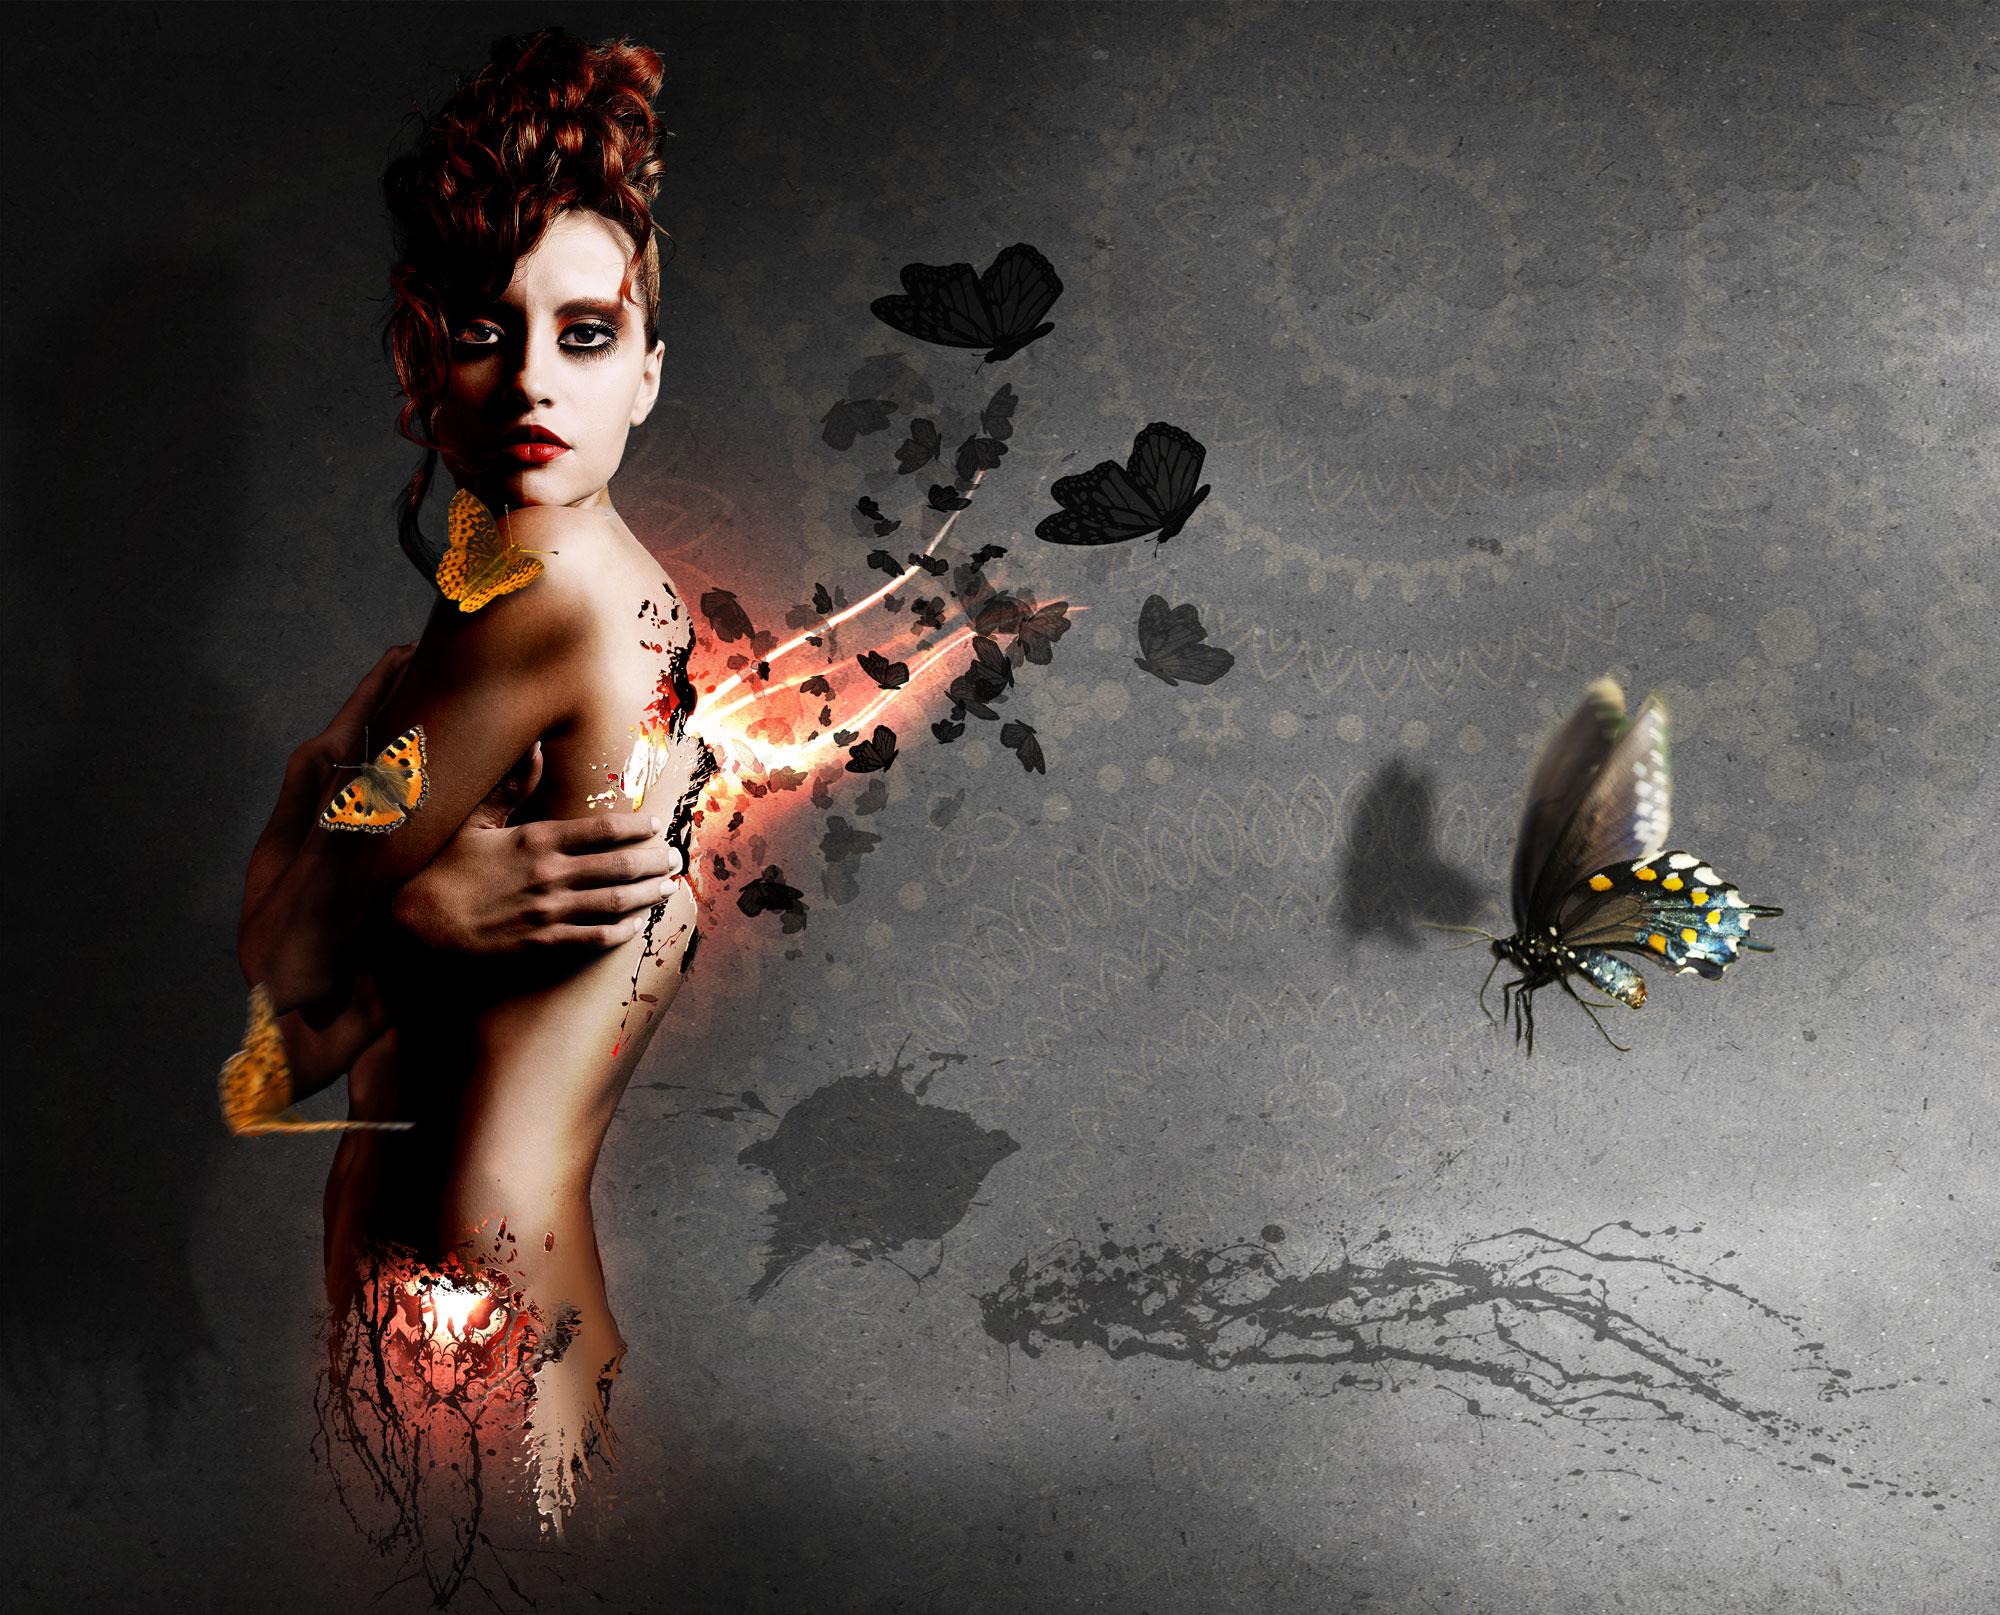 Mariposa photoshop